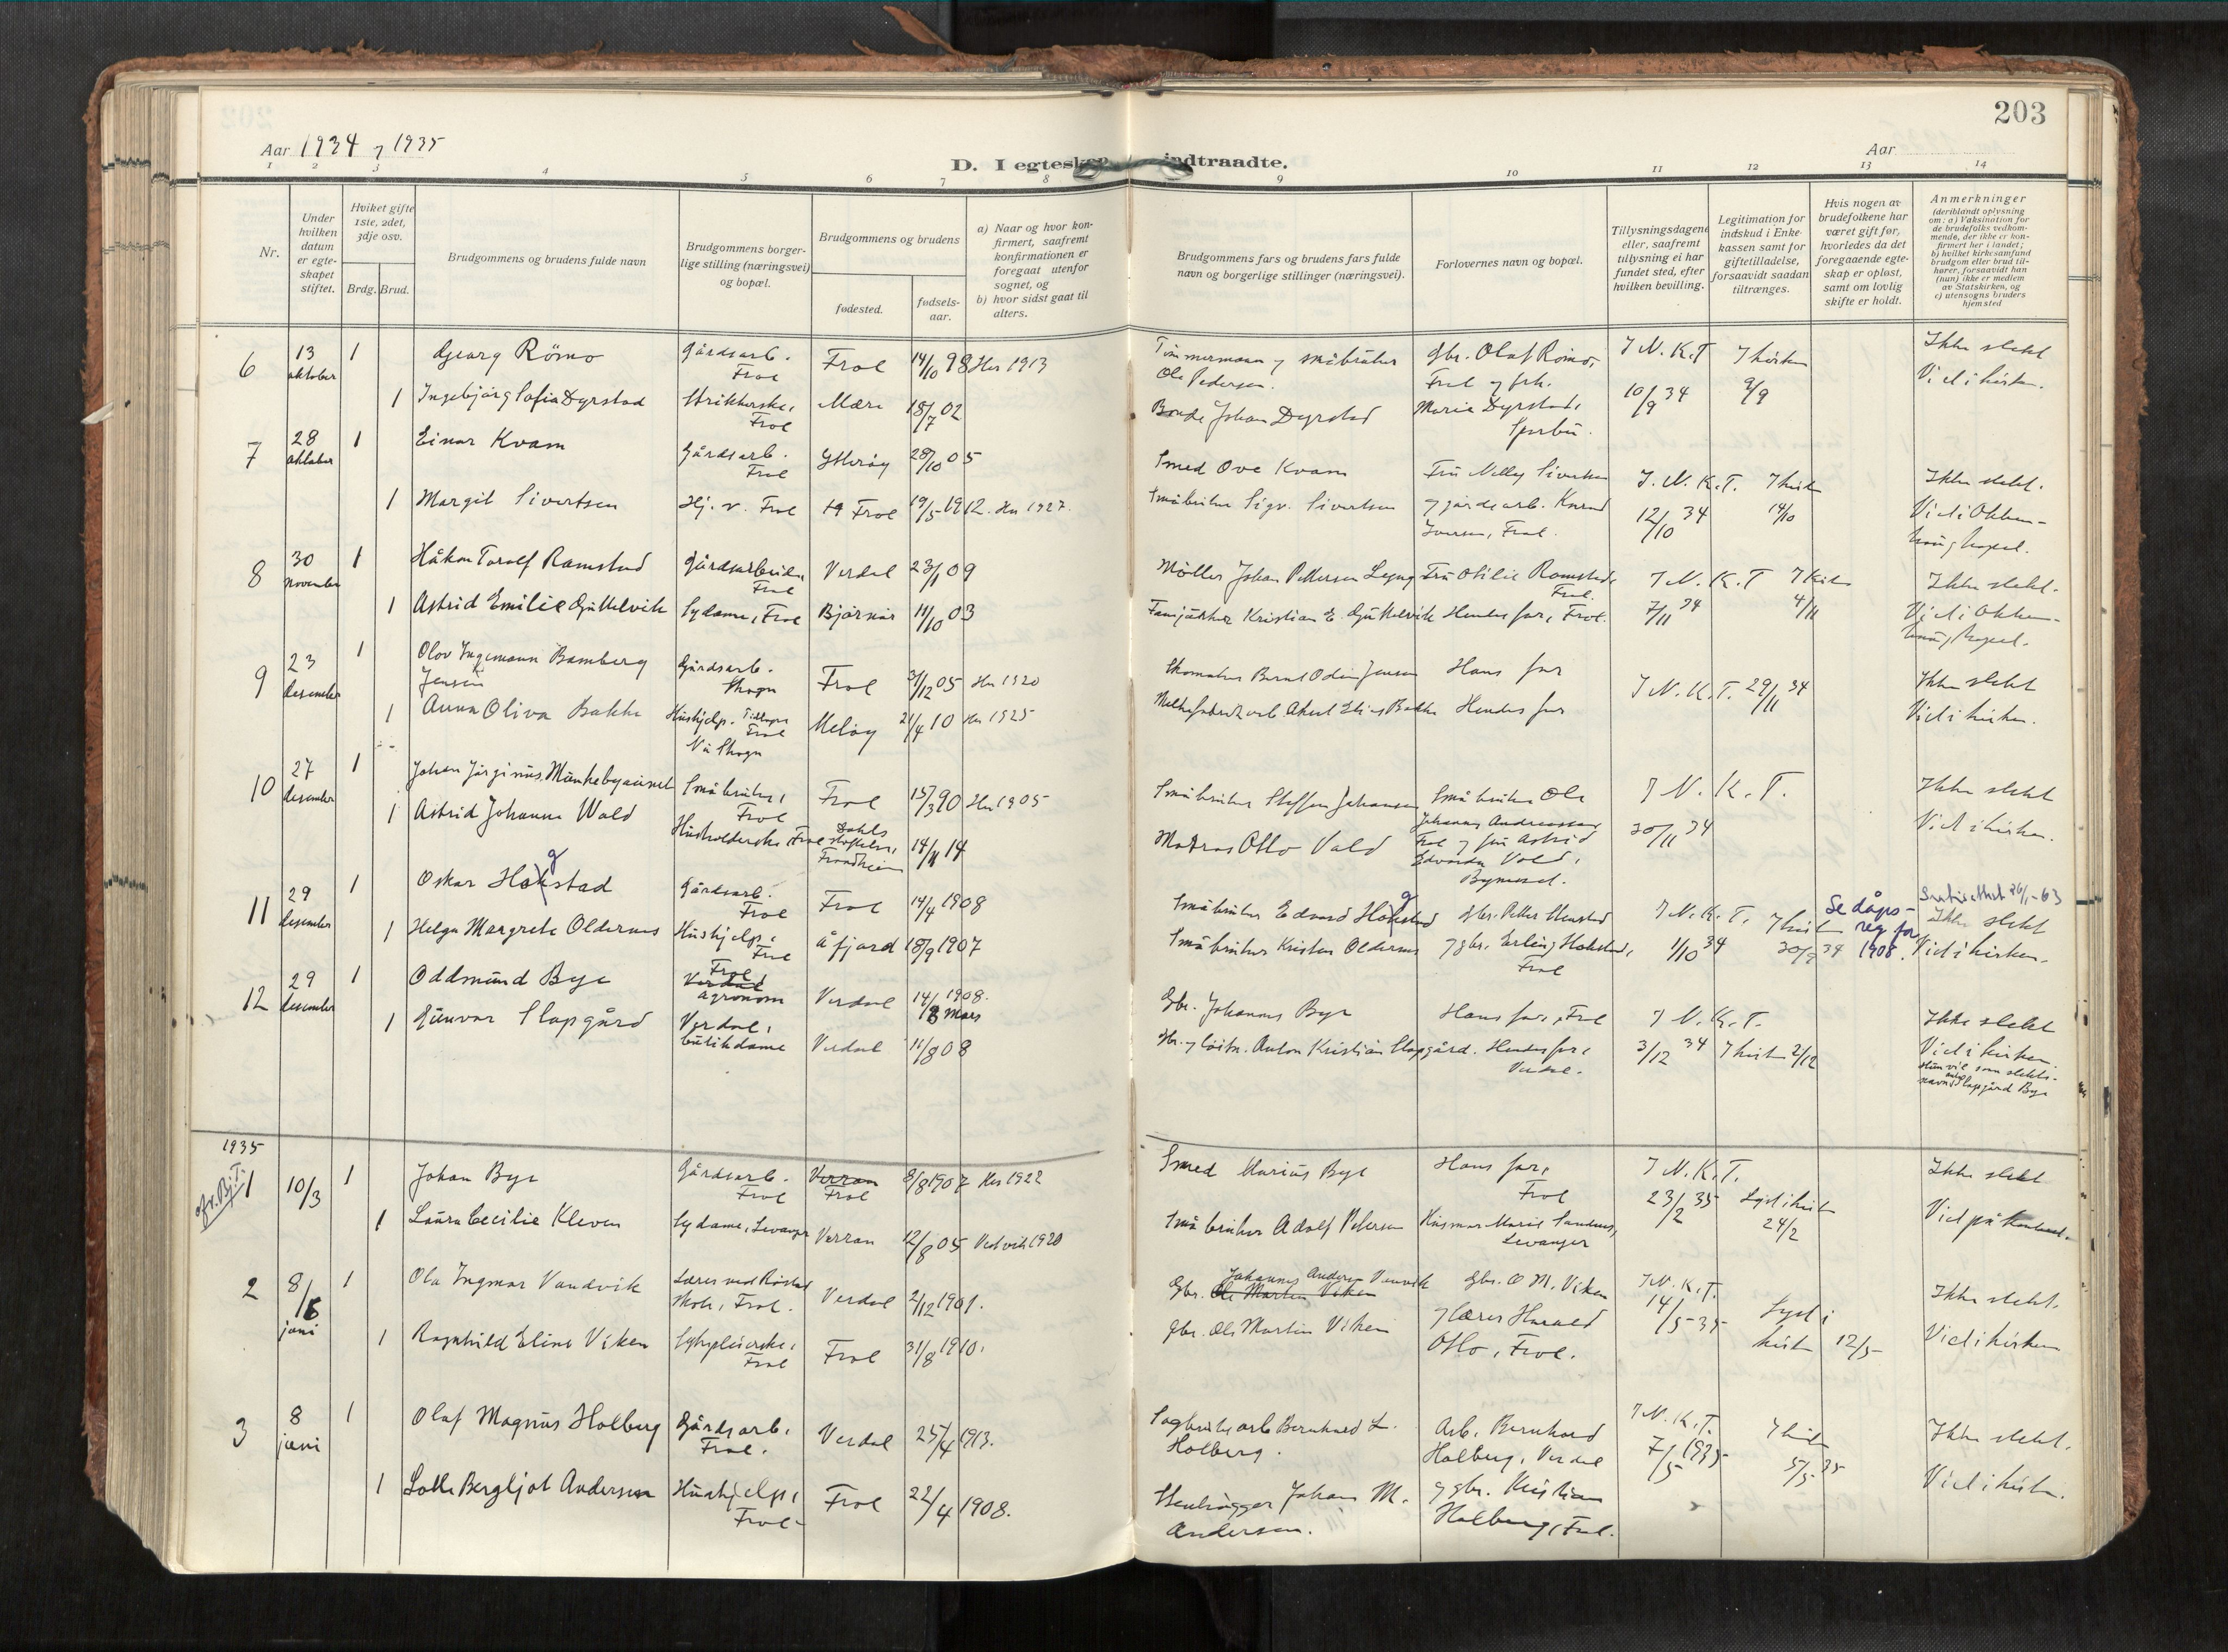 SAT, Levanger sokneprestkontor*, Parish register (official) no. 1, 1912-1935, p. 203